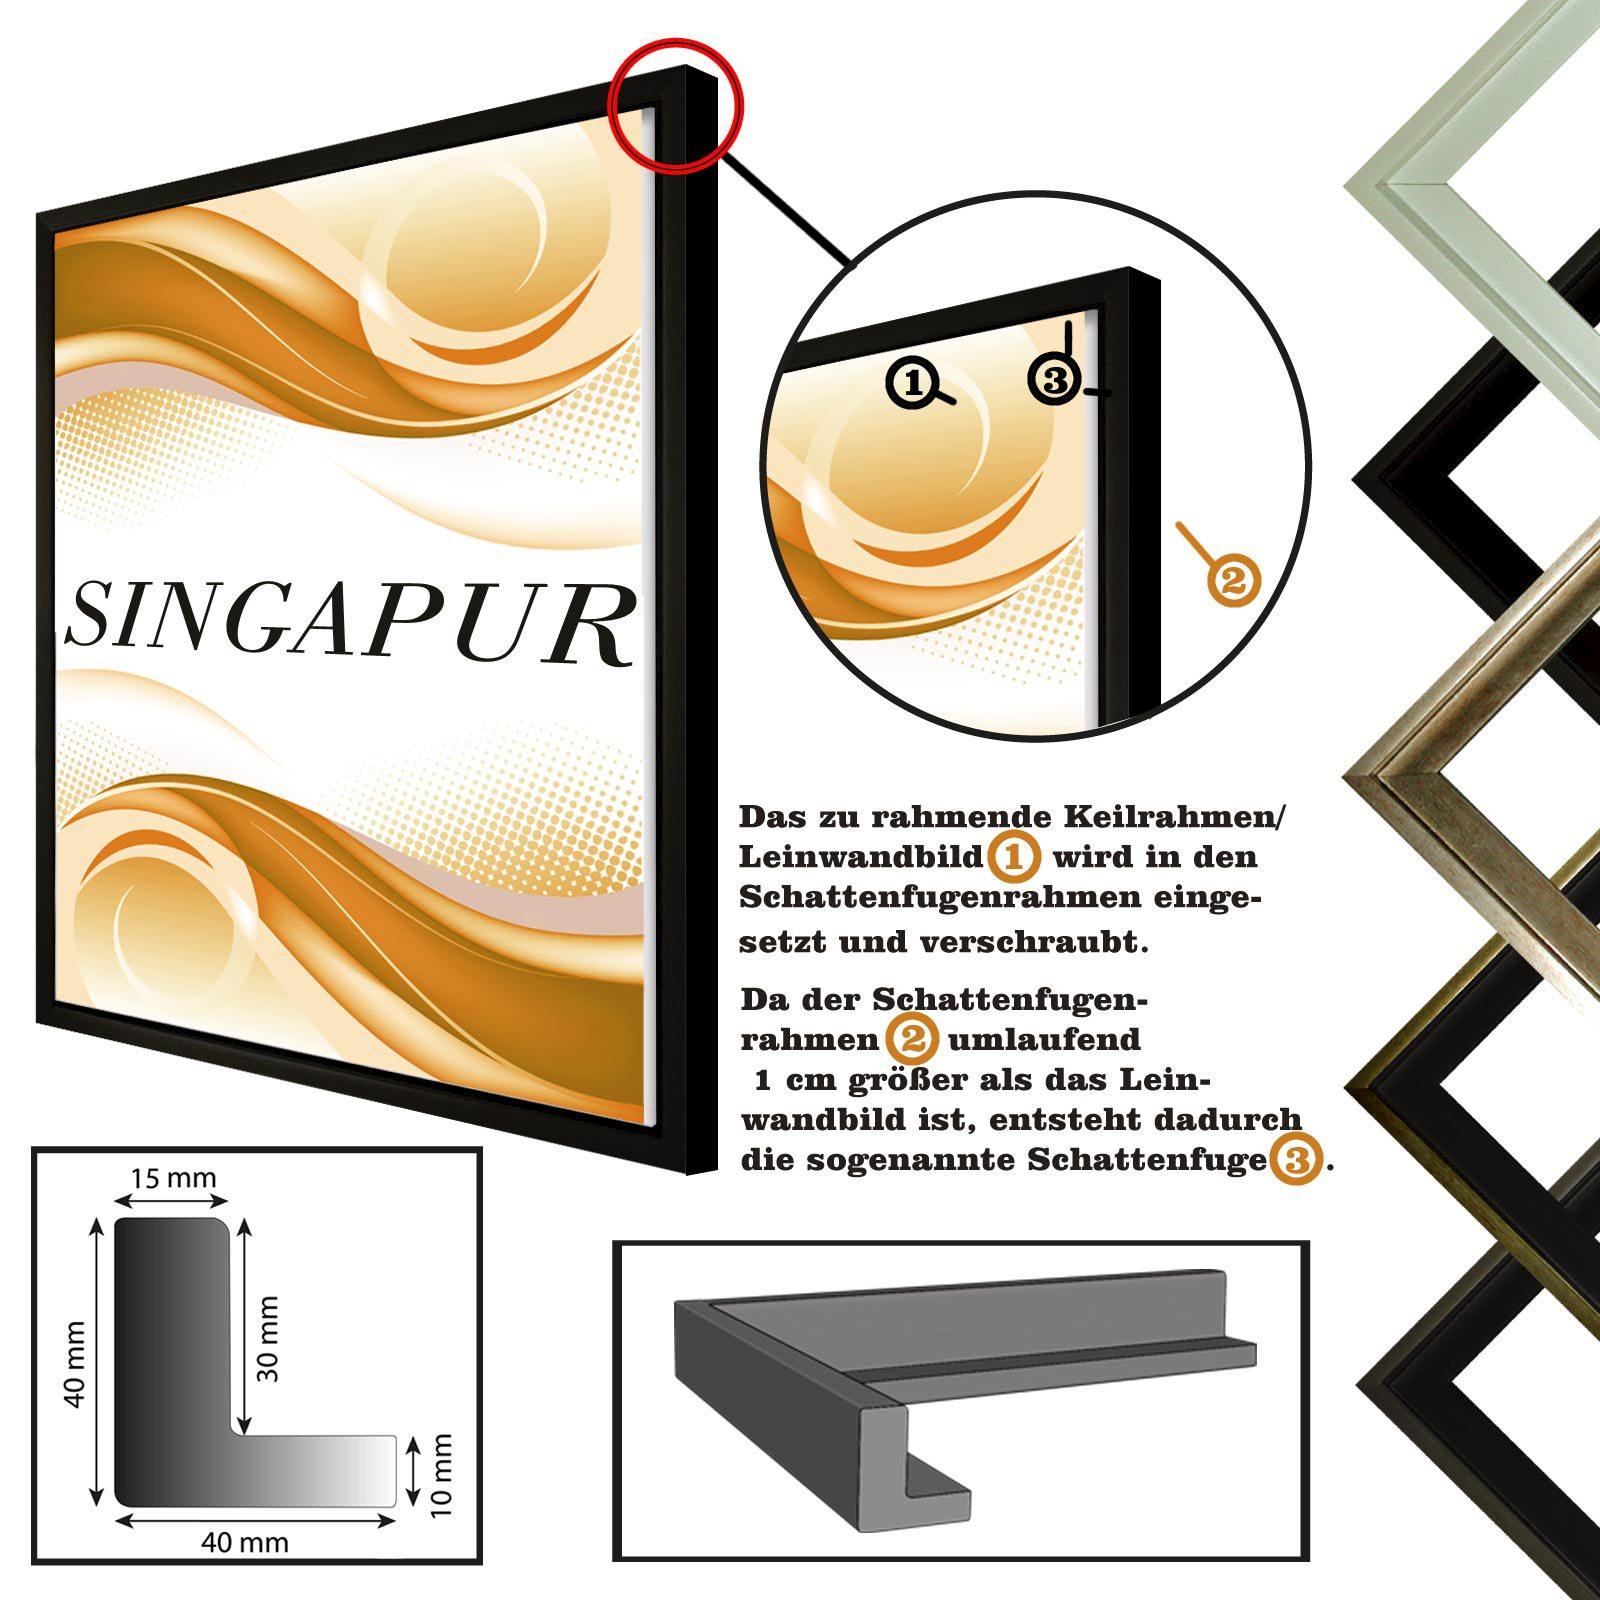 Ombra cornice singapur per tela canvas prints in 5 for Cornice poster 61x91